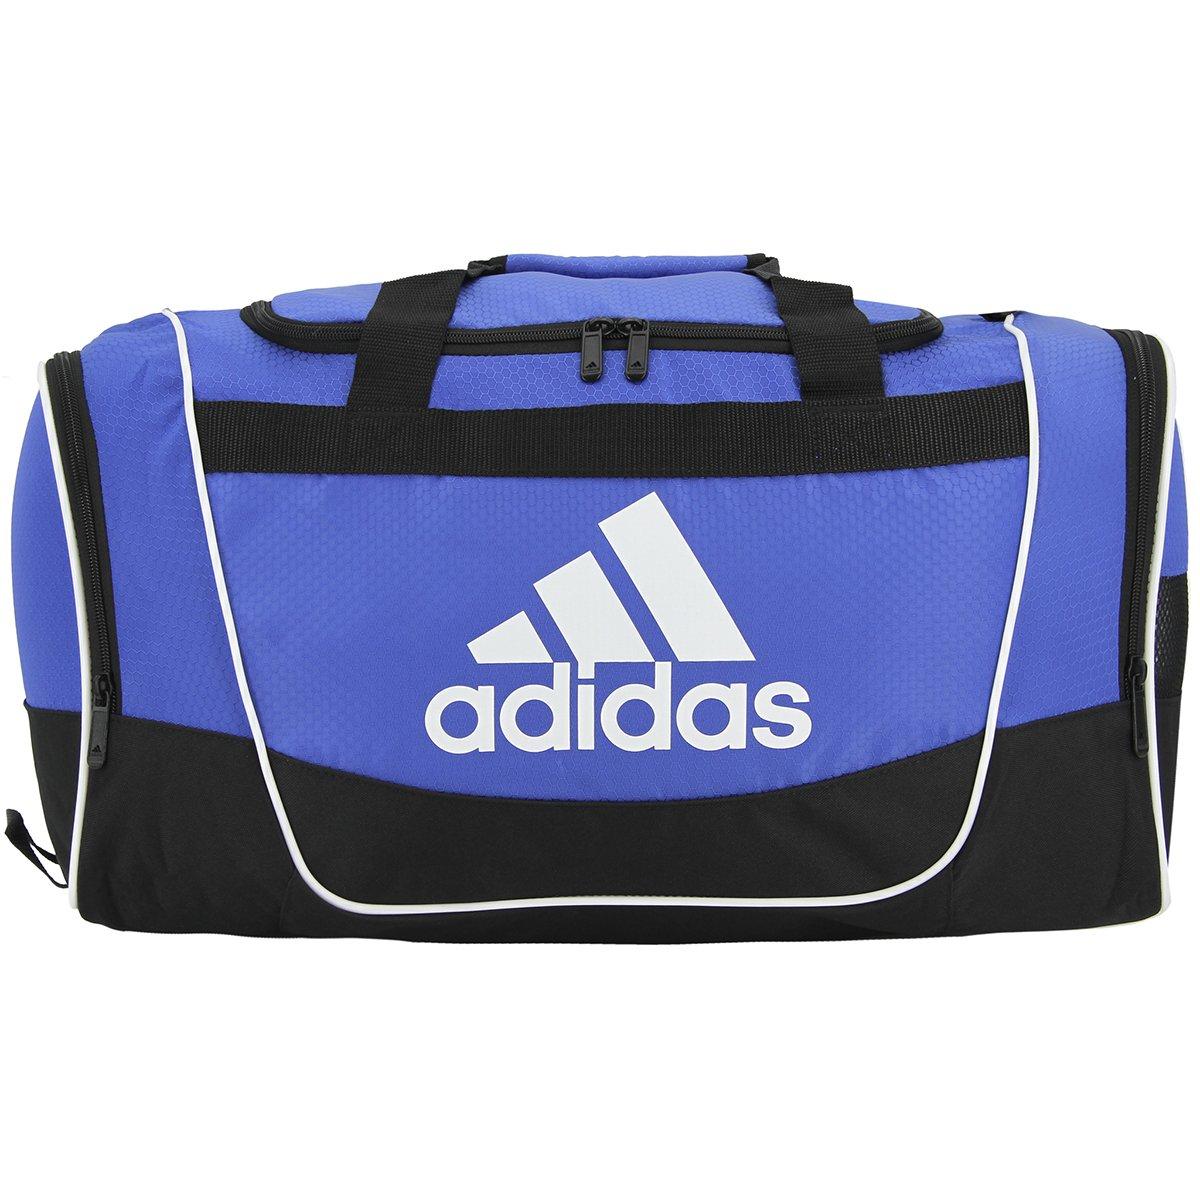 91f35698da adidas Defender II Duffel Bag 6pm adidas Bags Christmas Gifts 2018